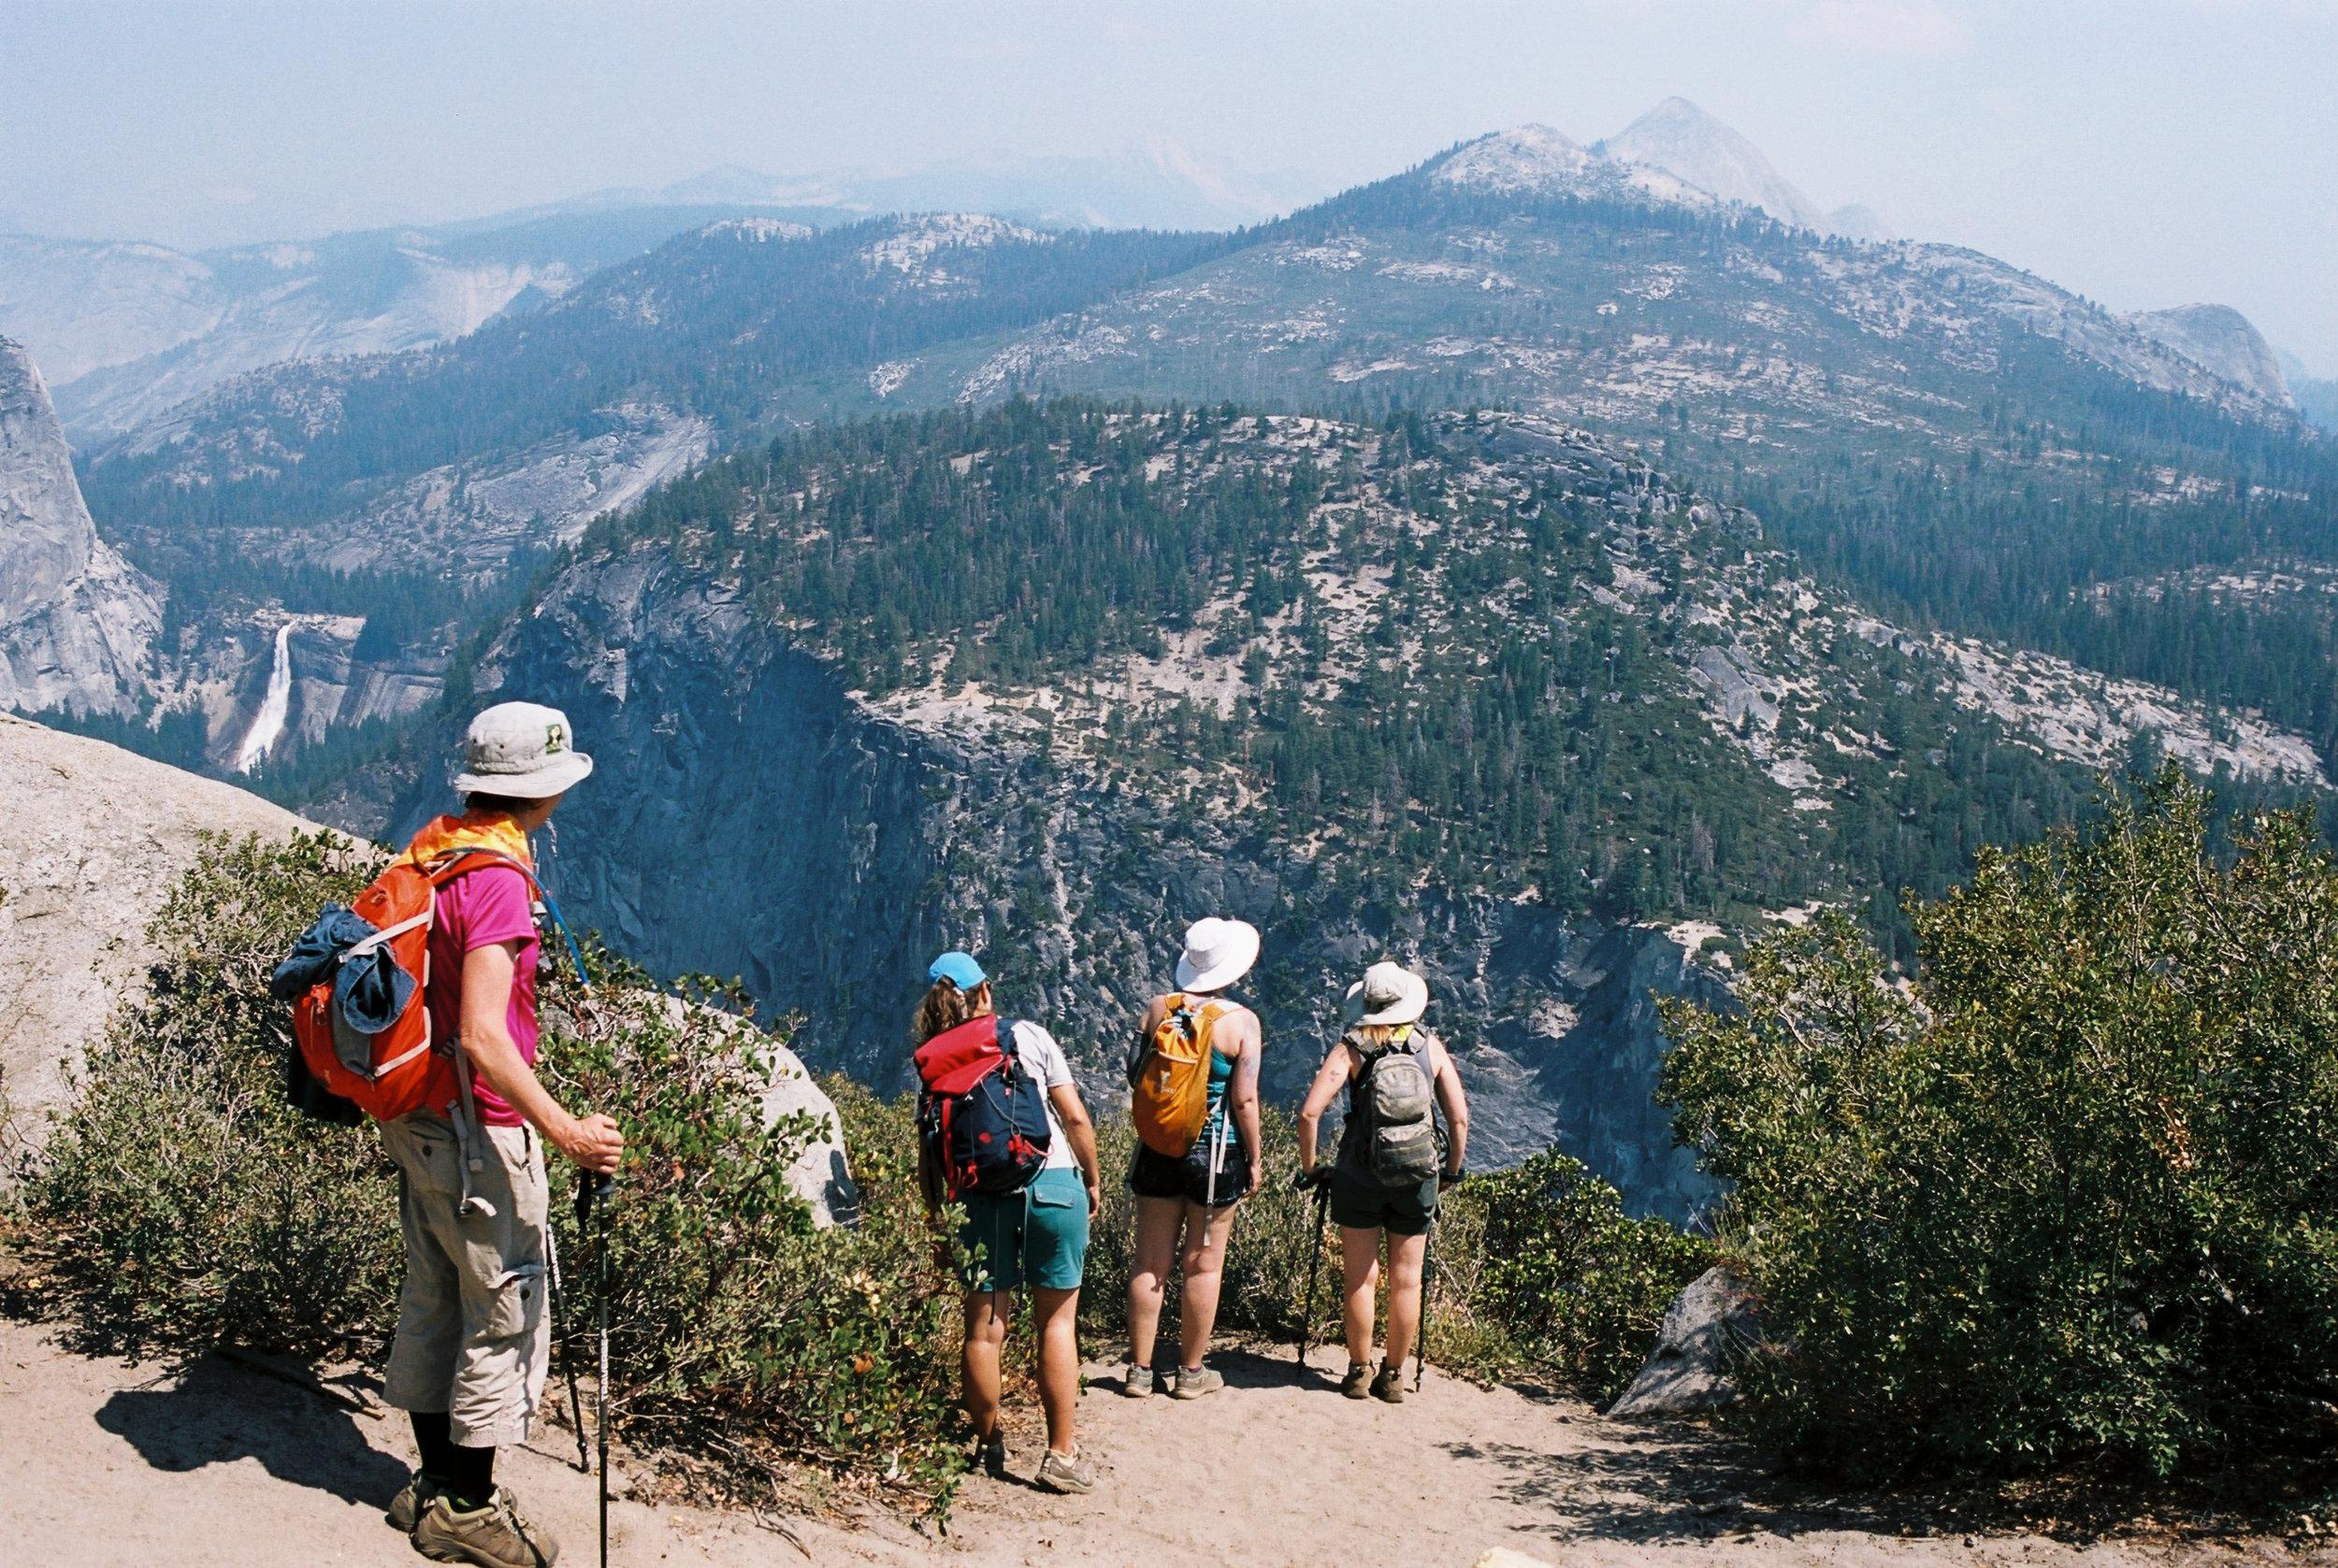 2017_susanadler_Yosemite30616.jpg